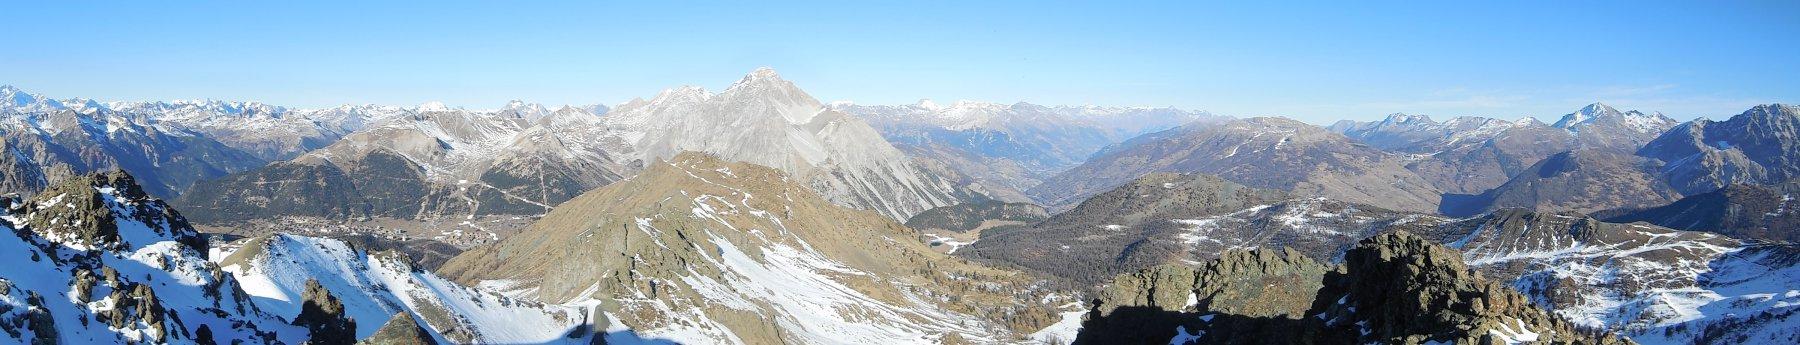 Panorama desolante per la poca neve